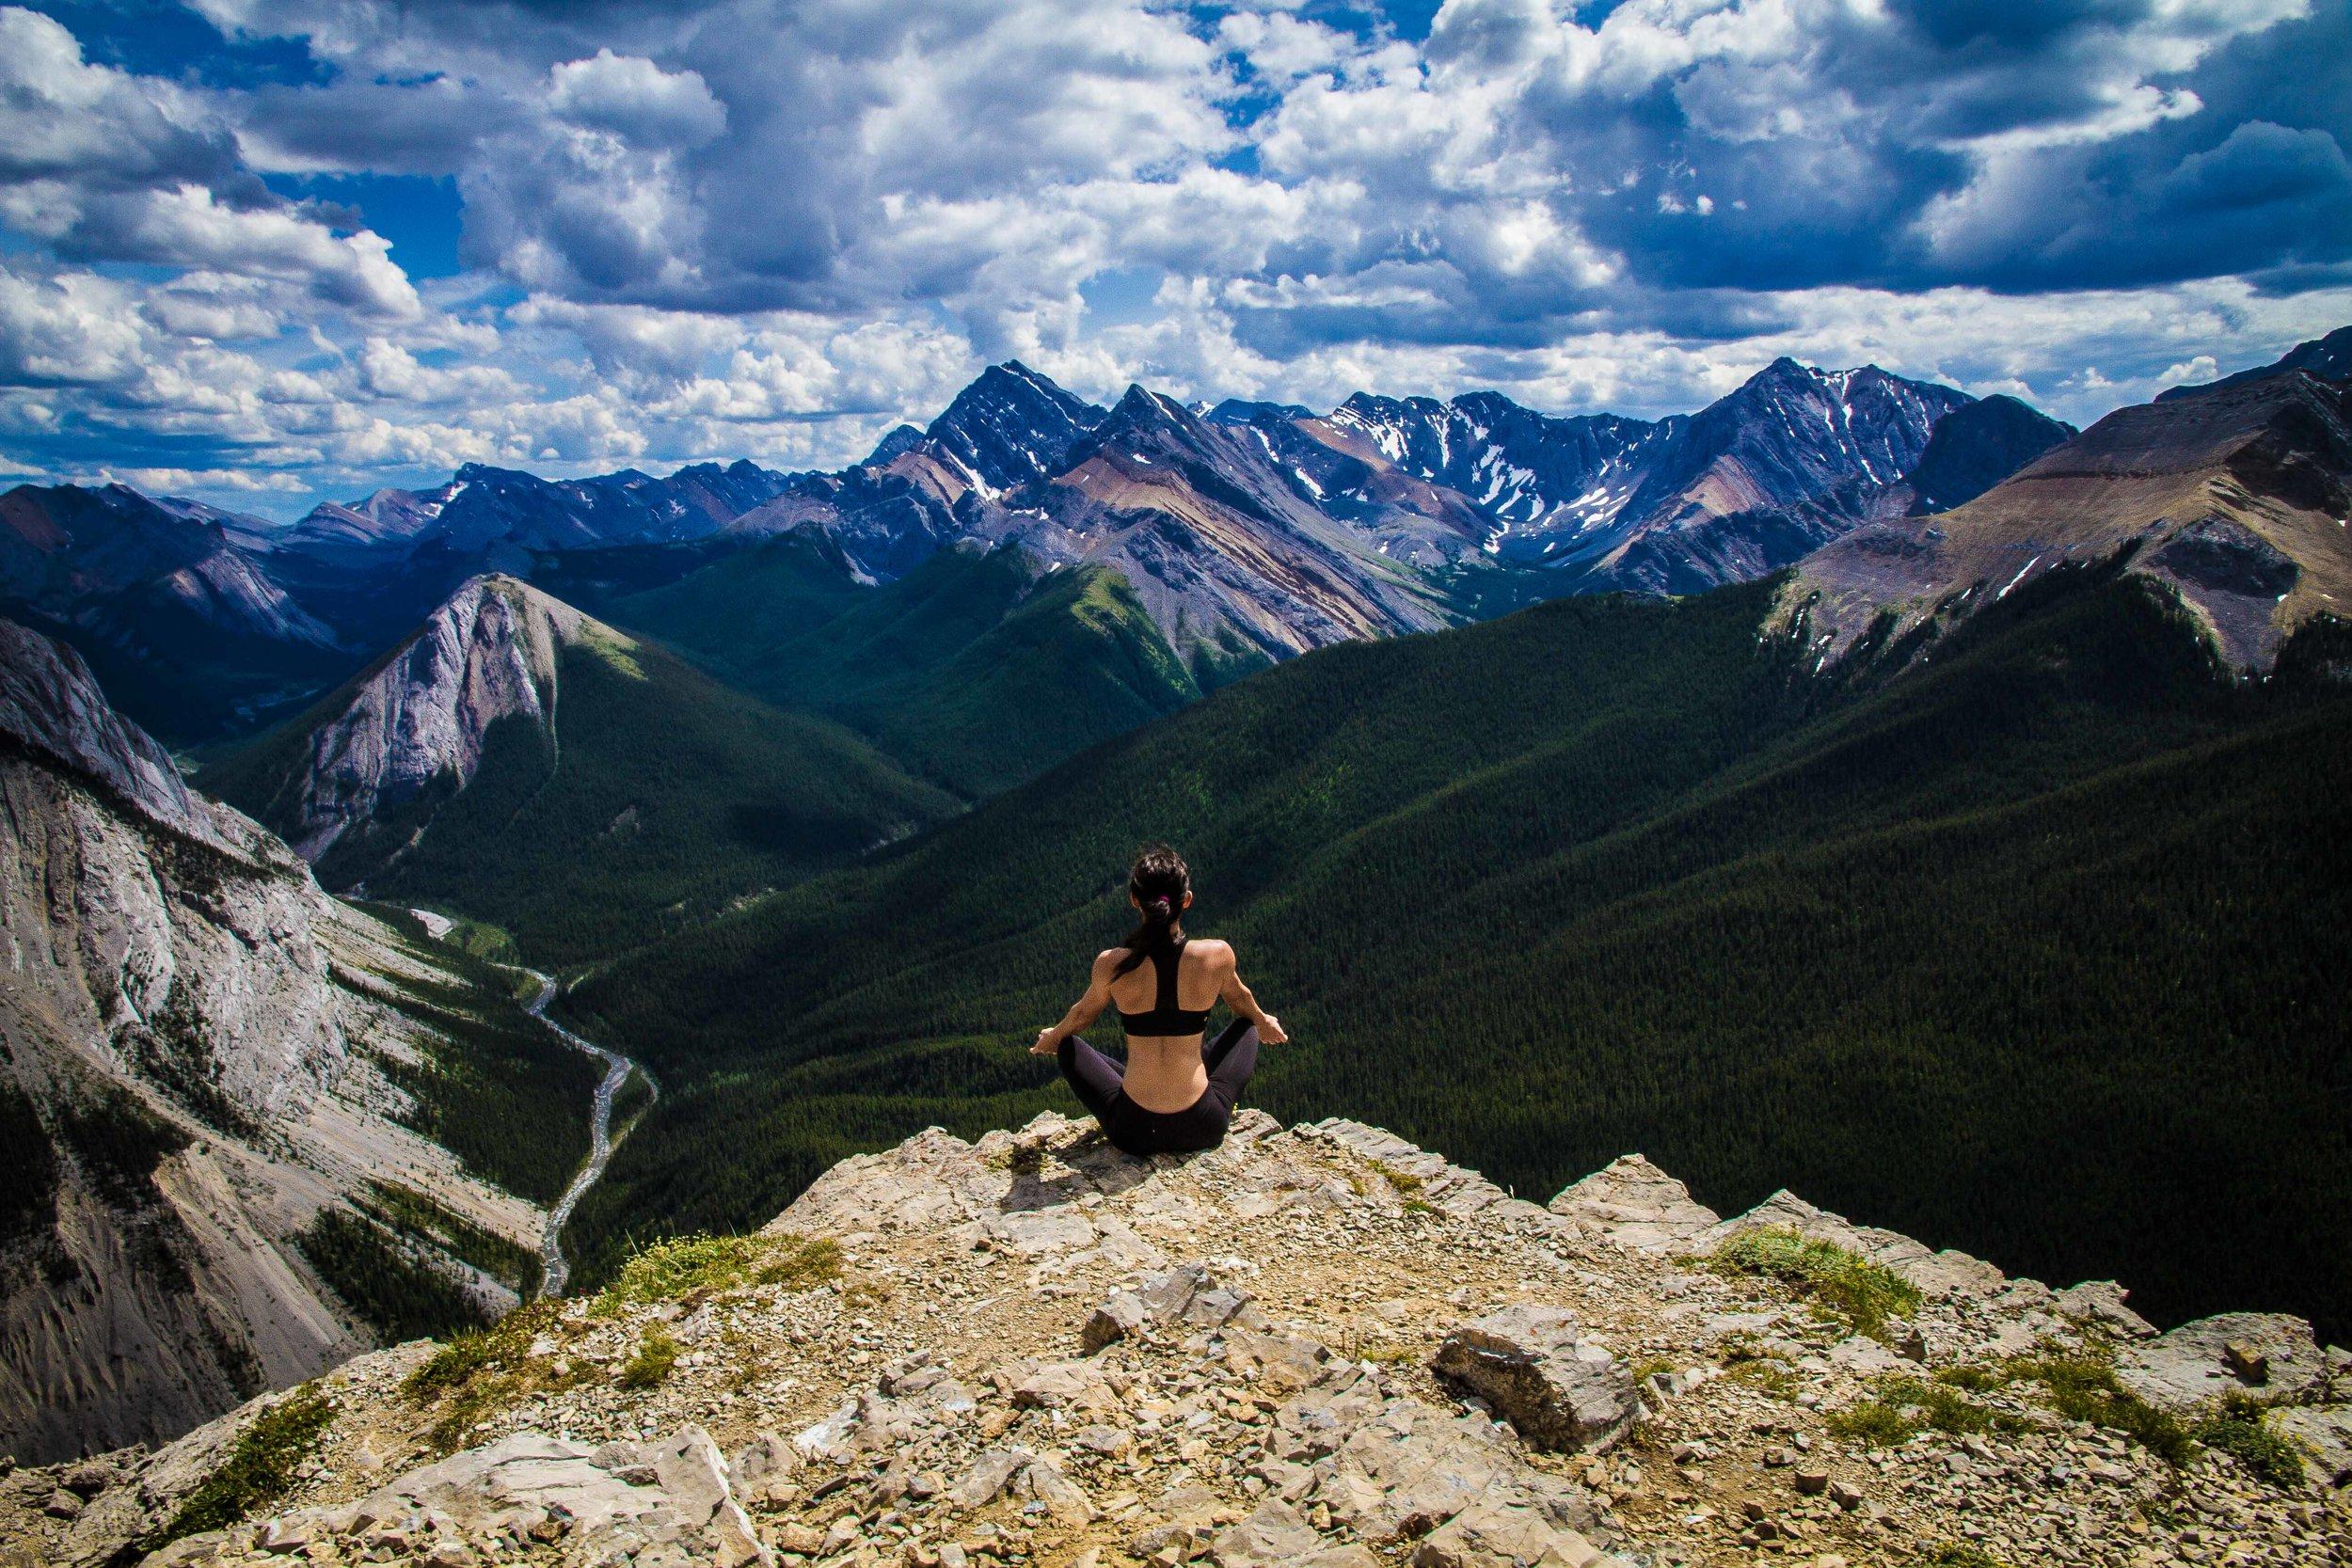 Edith Werbel, Trainer Edith, BodyRock, BodyRock Elevate, Rocky Mountains, Fitness Photographer